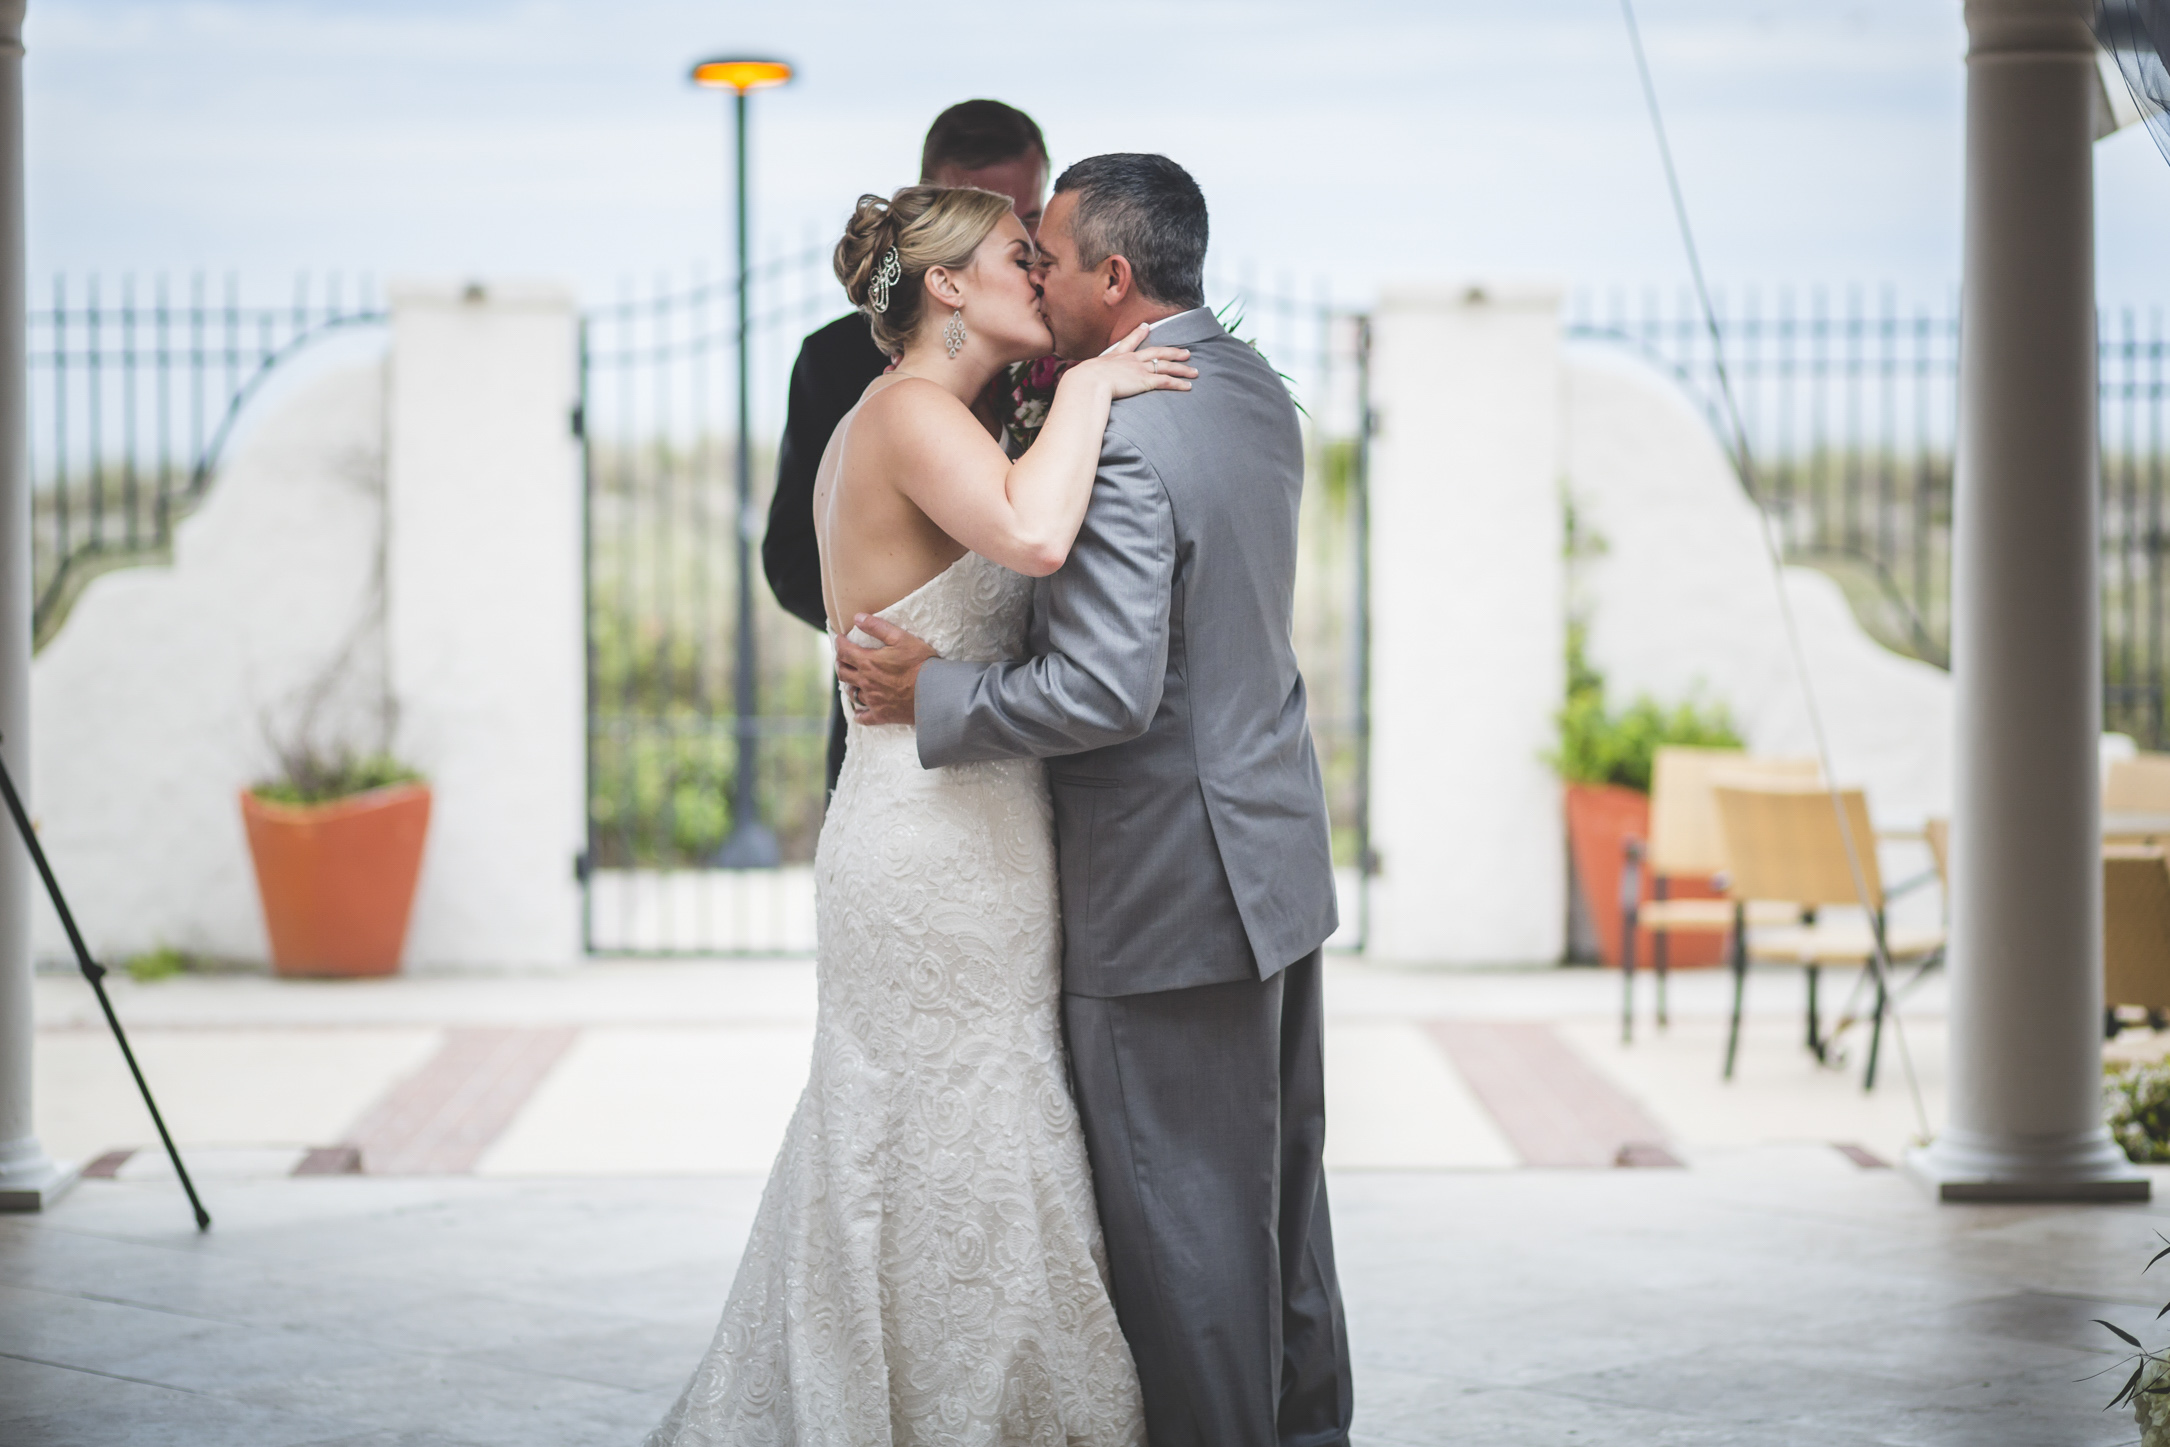 adam-szarmack-casa-marina-wedding-photographer-jacksonville-beach-florida-34.jpg